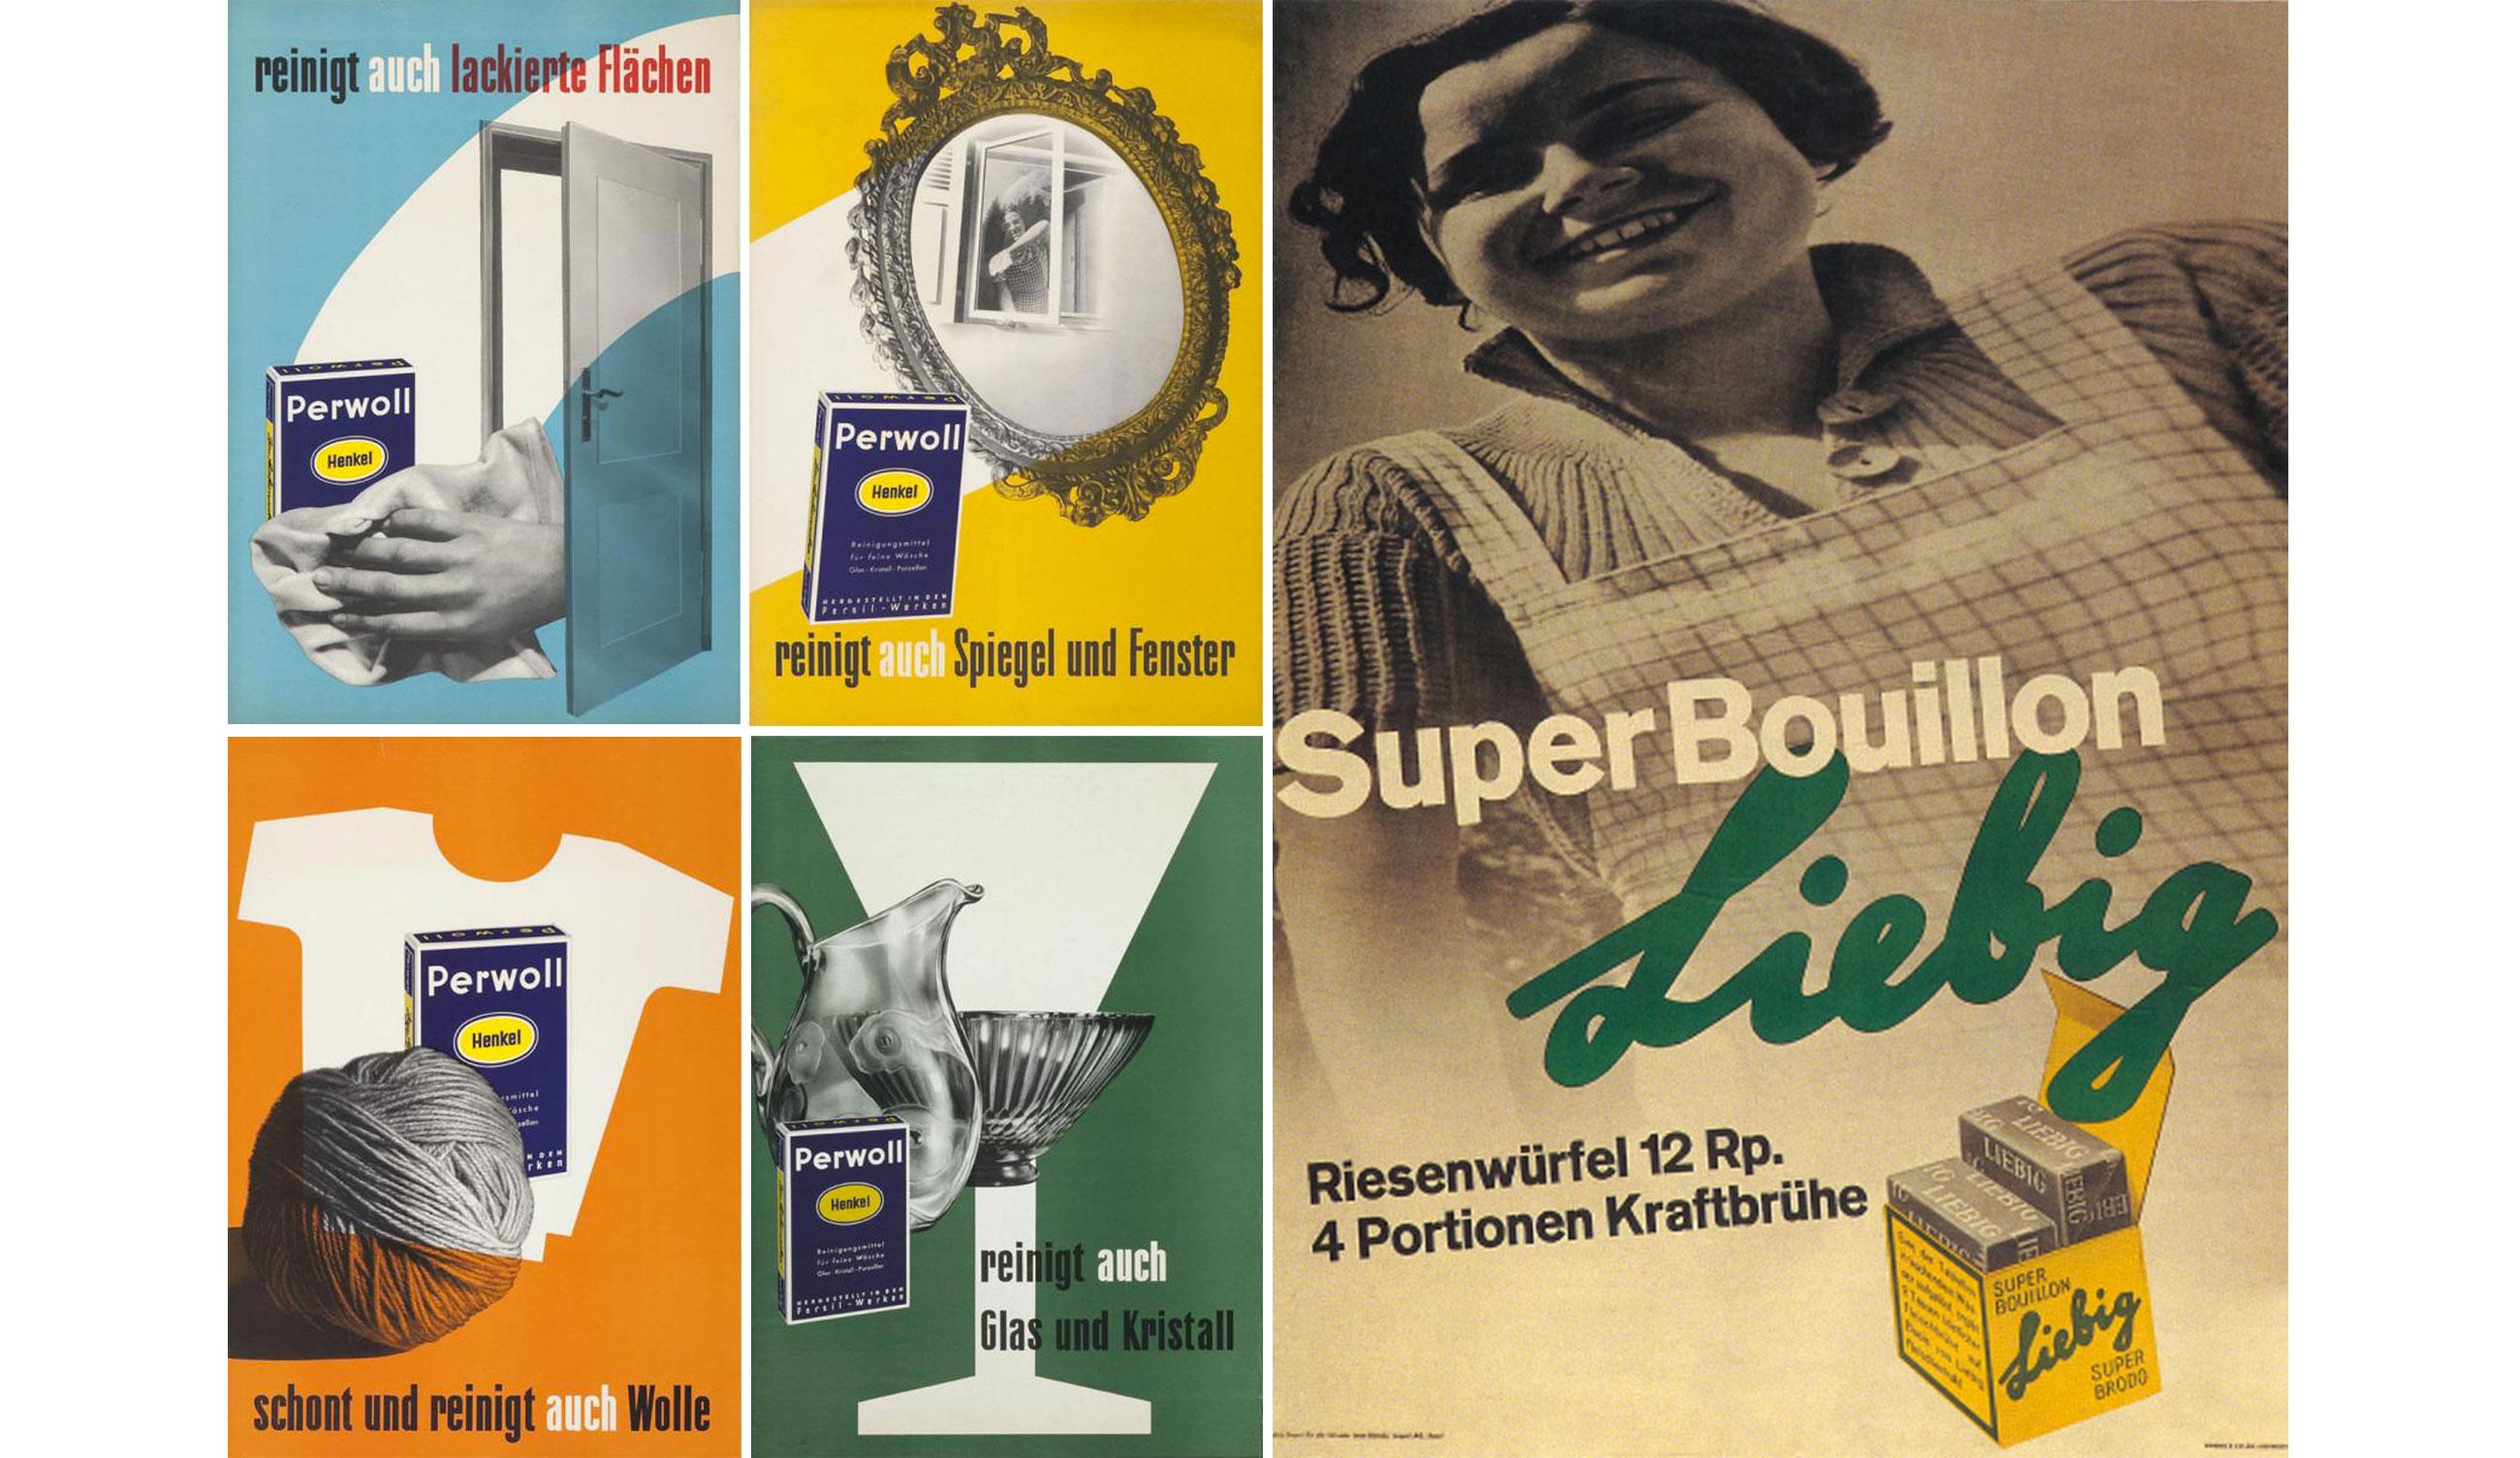 Anton-Stankowski-affiches-liebig-super-bouillon-1934-perwoll